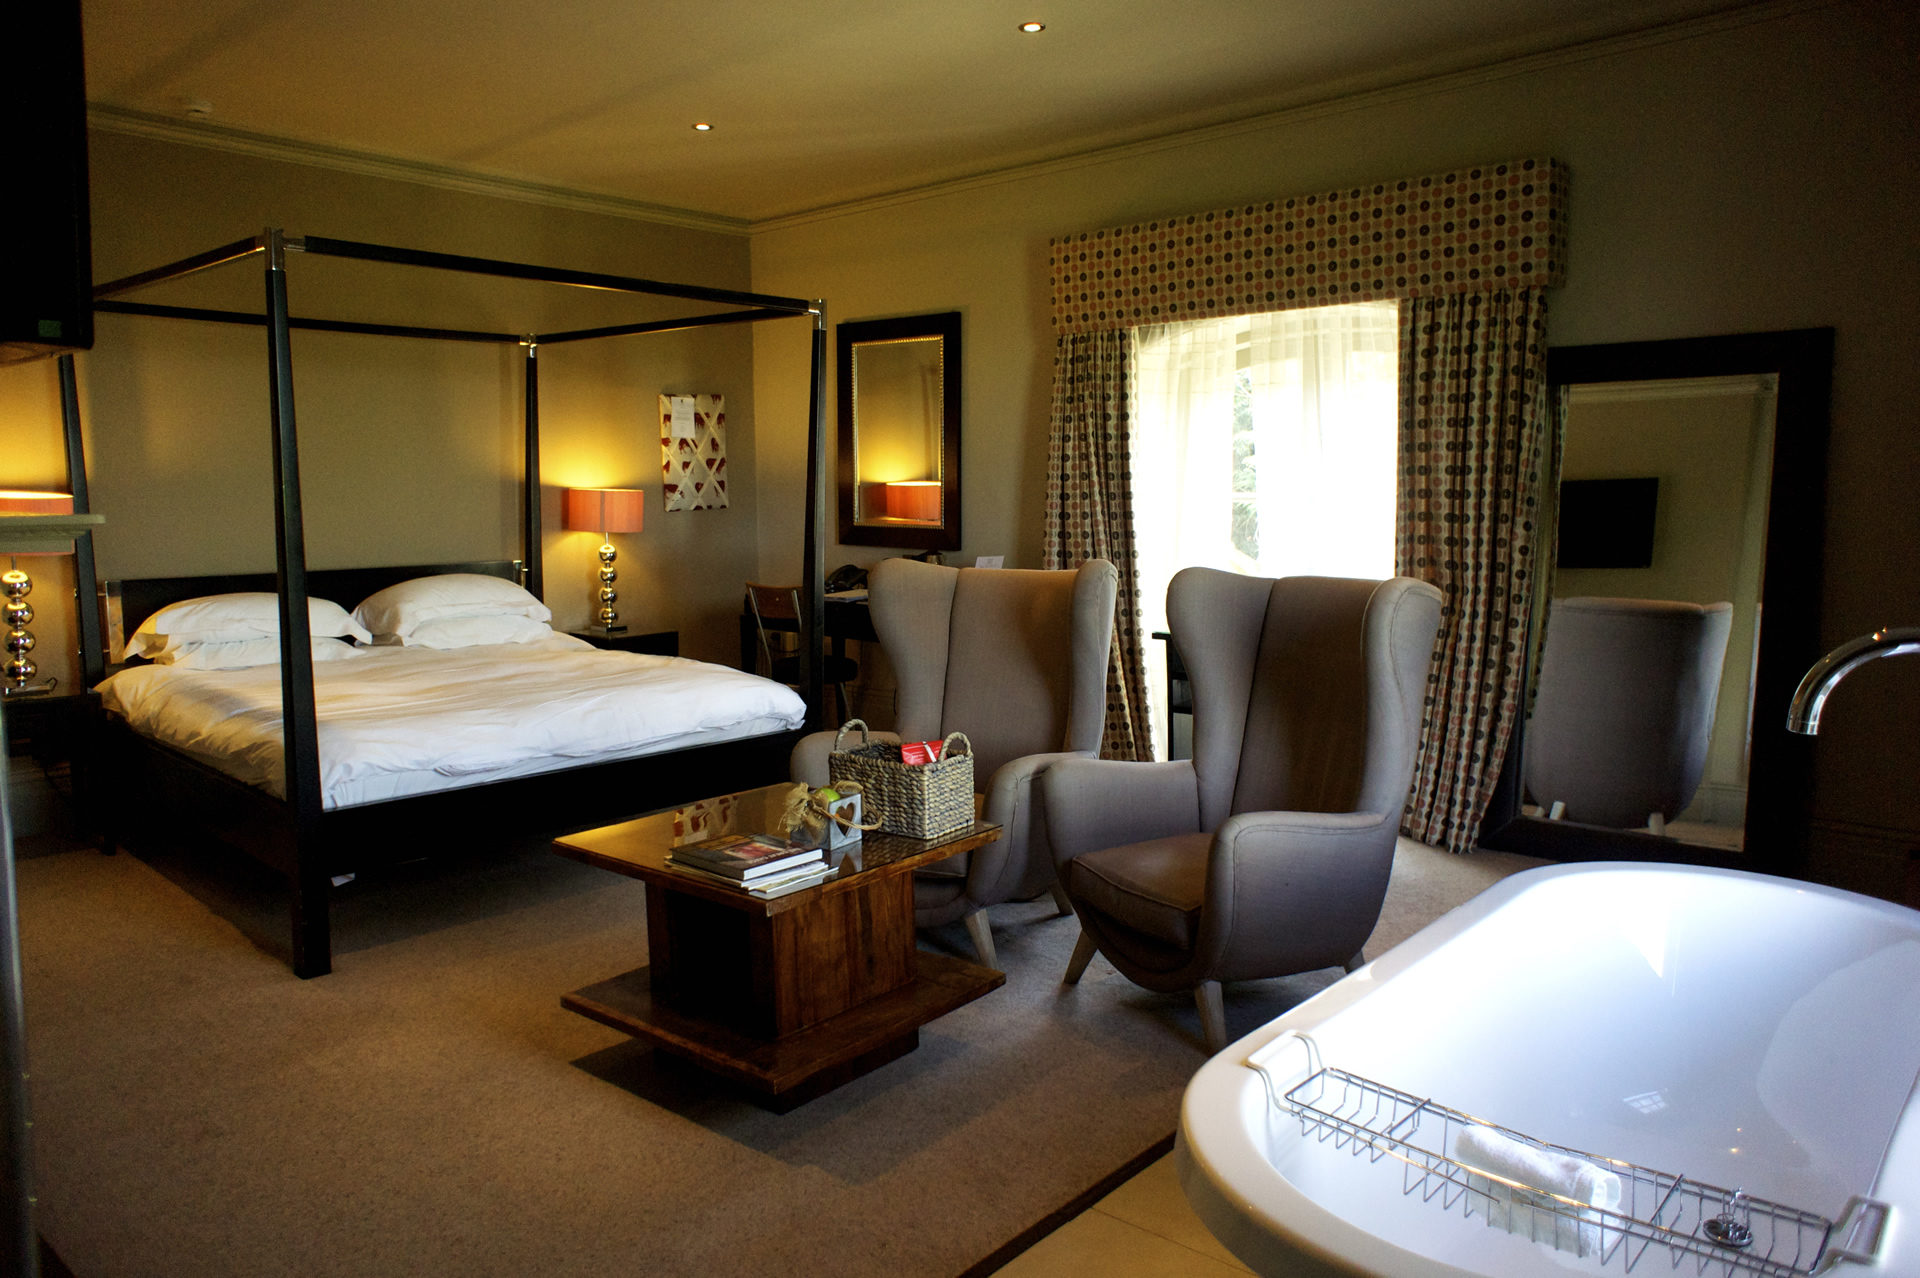 Verzon House Accommodation Hotel Herefordshire